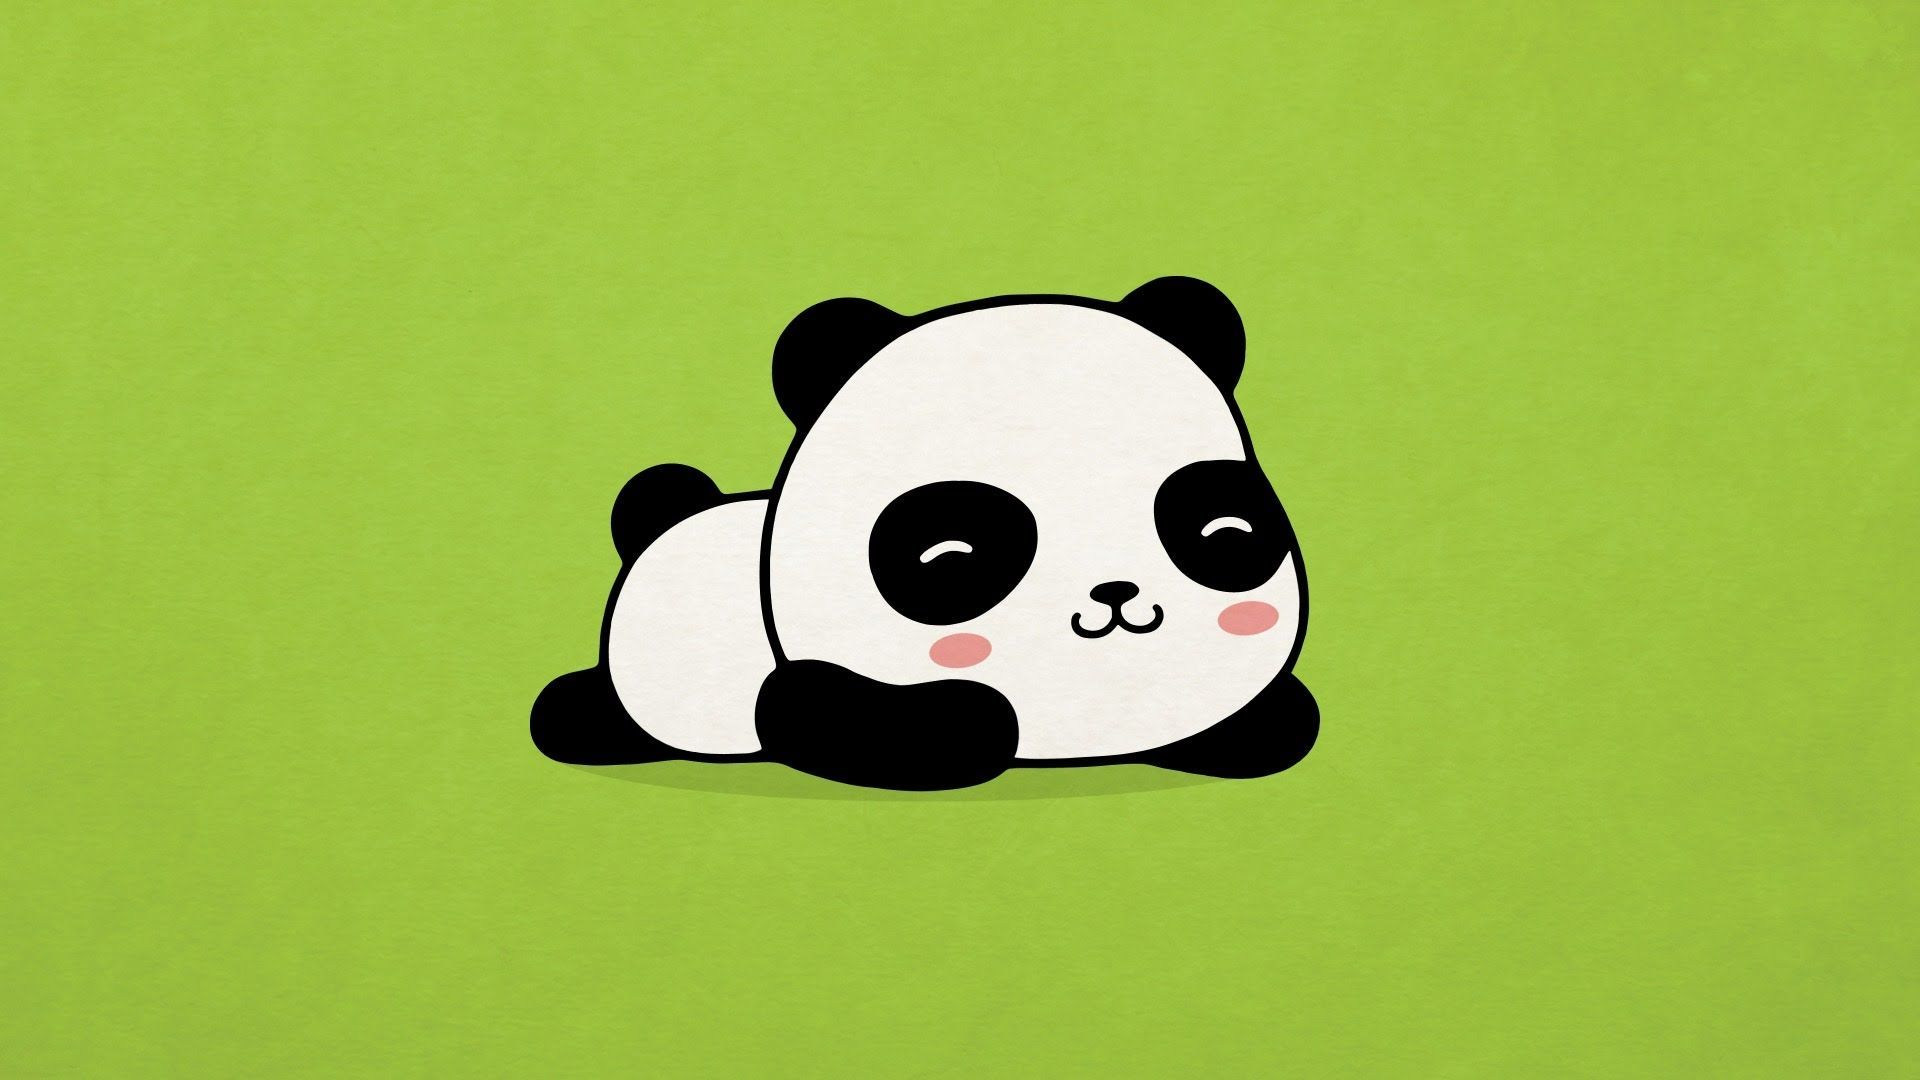 Drawn Wallpapers Panda